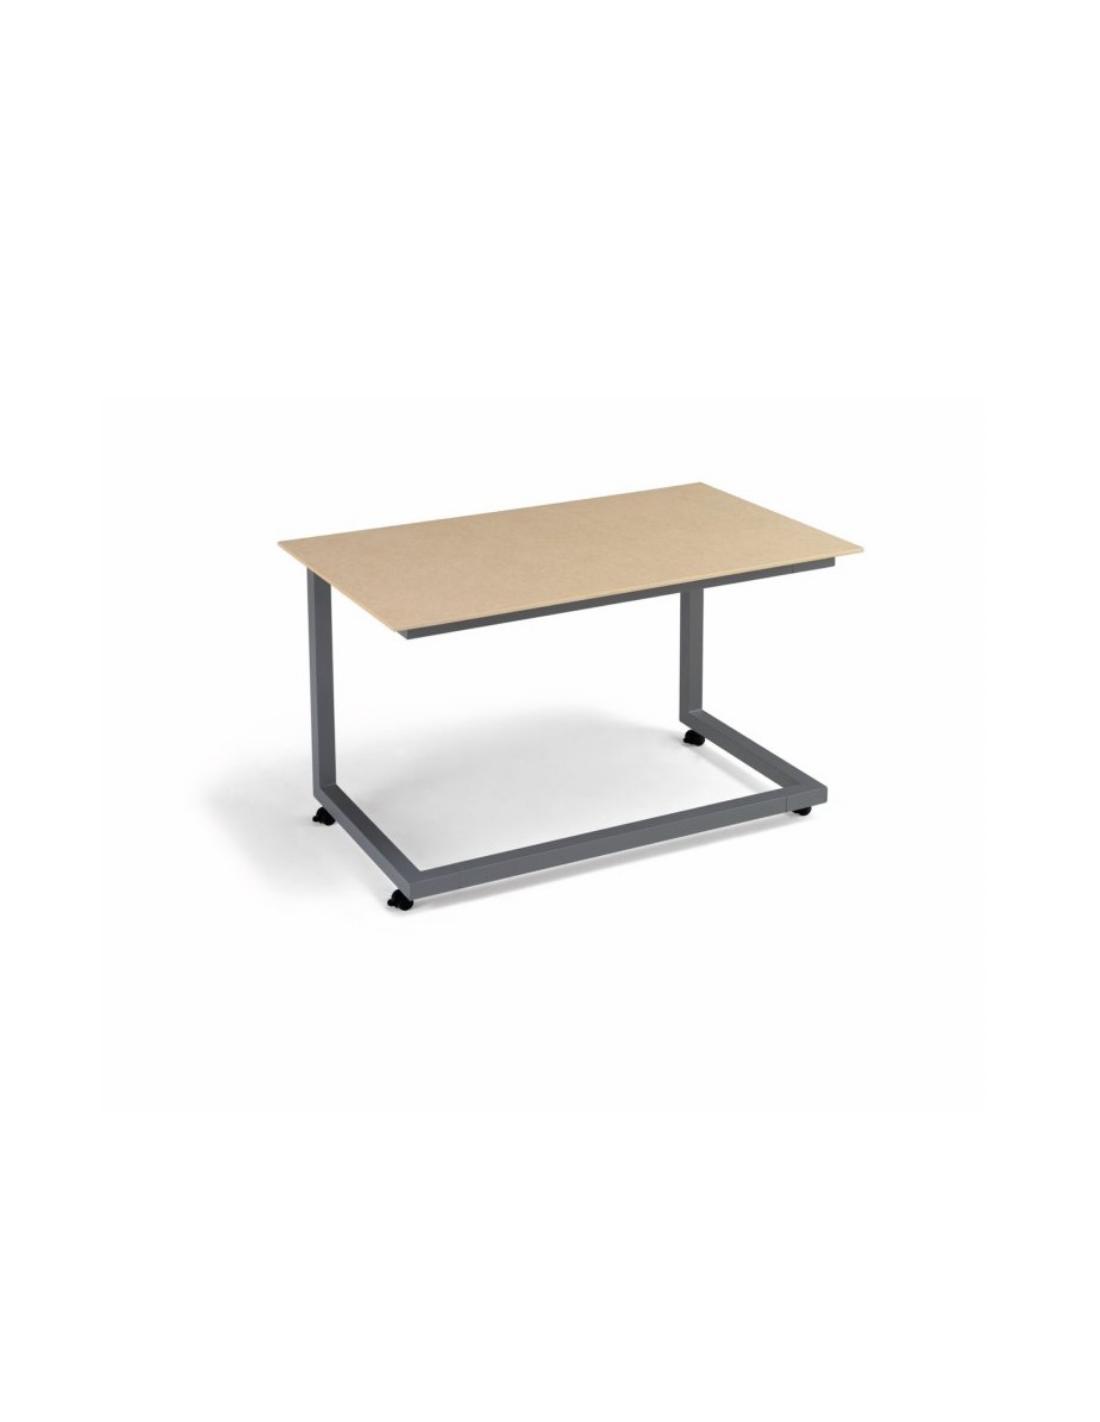 Mesa rectangular de madera maciza de olmo